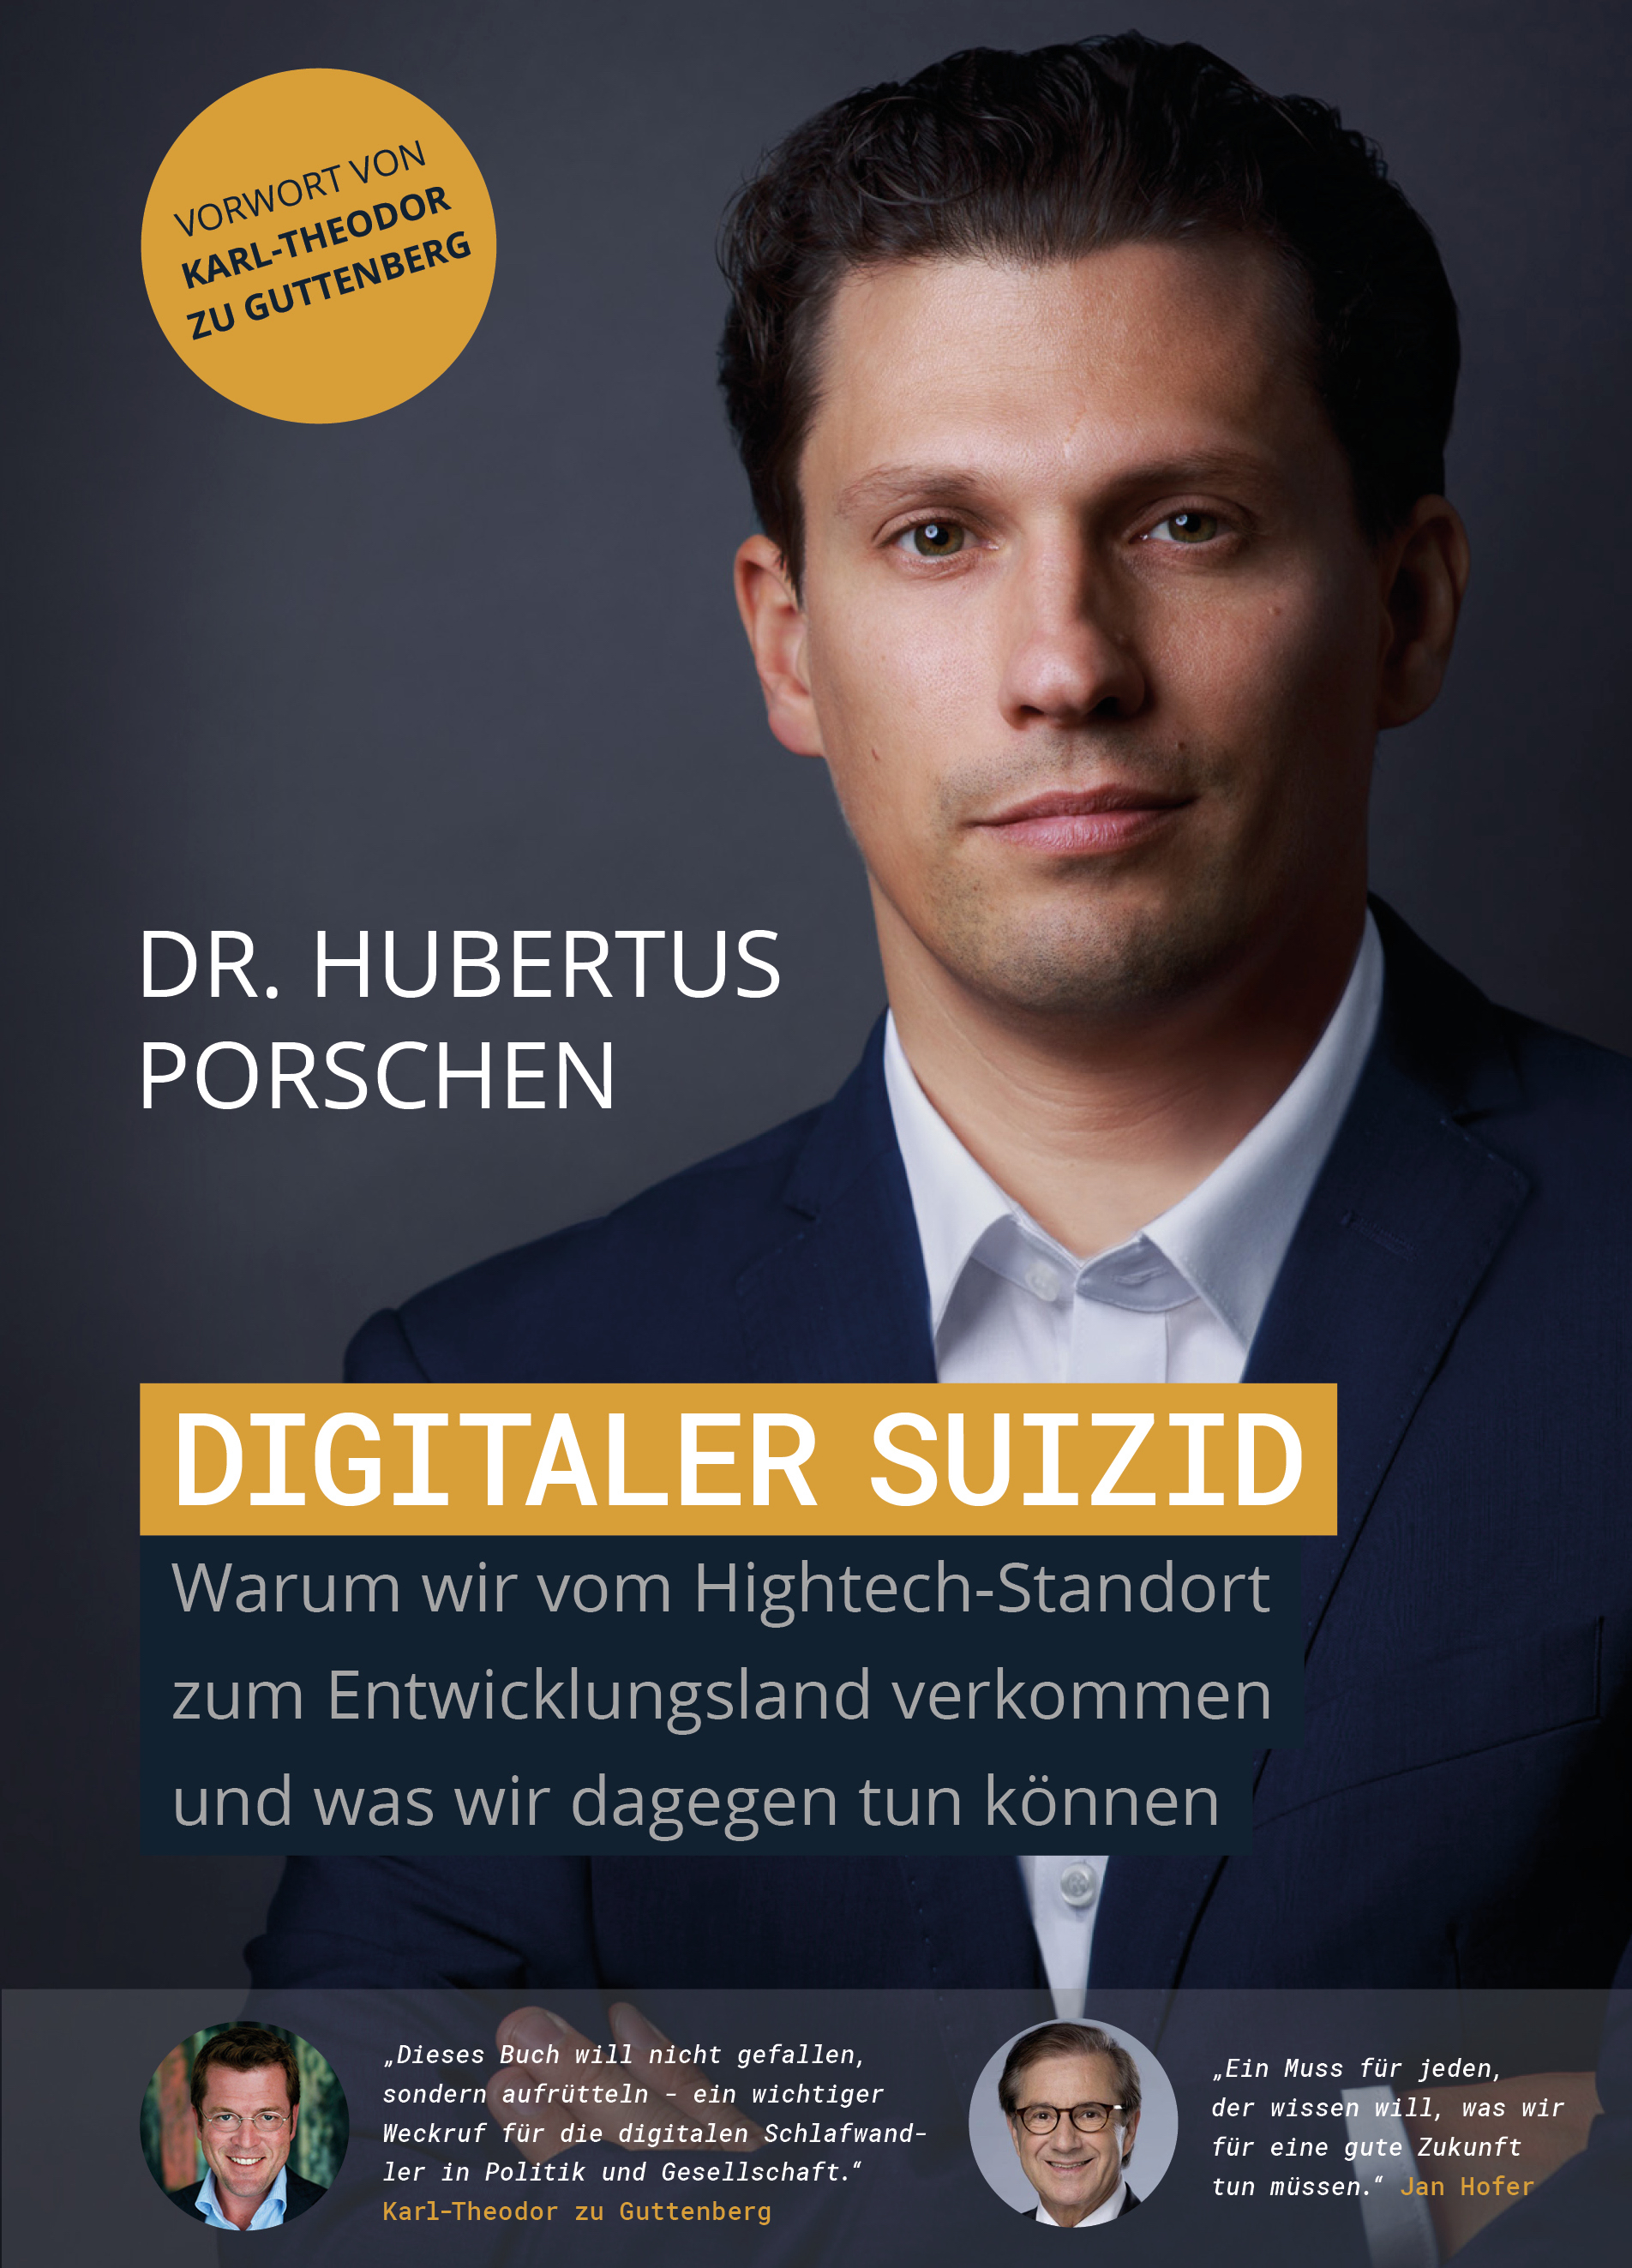 Expert Marketplace -  Hubertus Porschen  - Digitaler Suizid